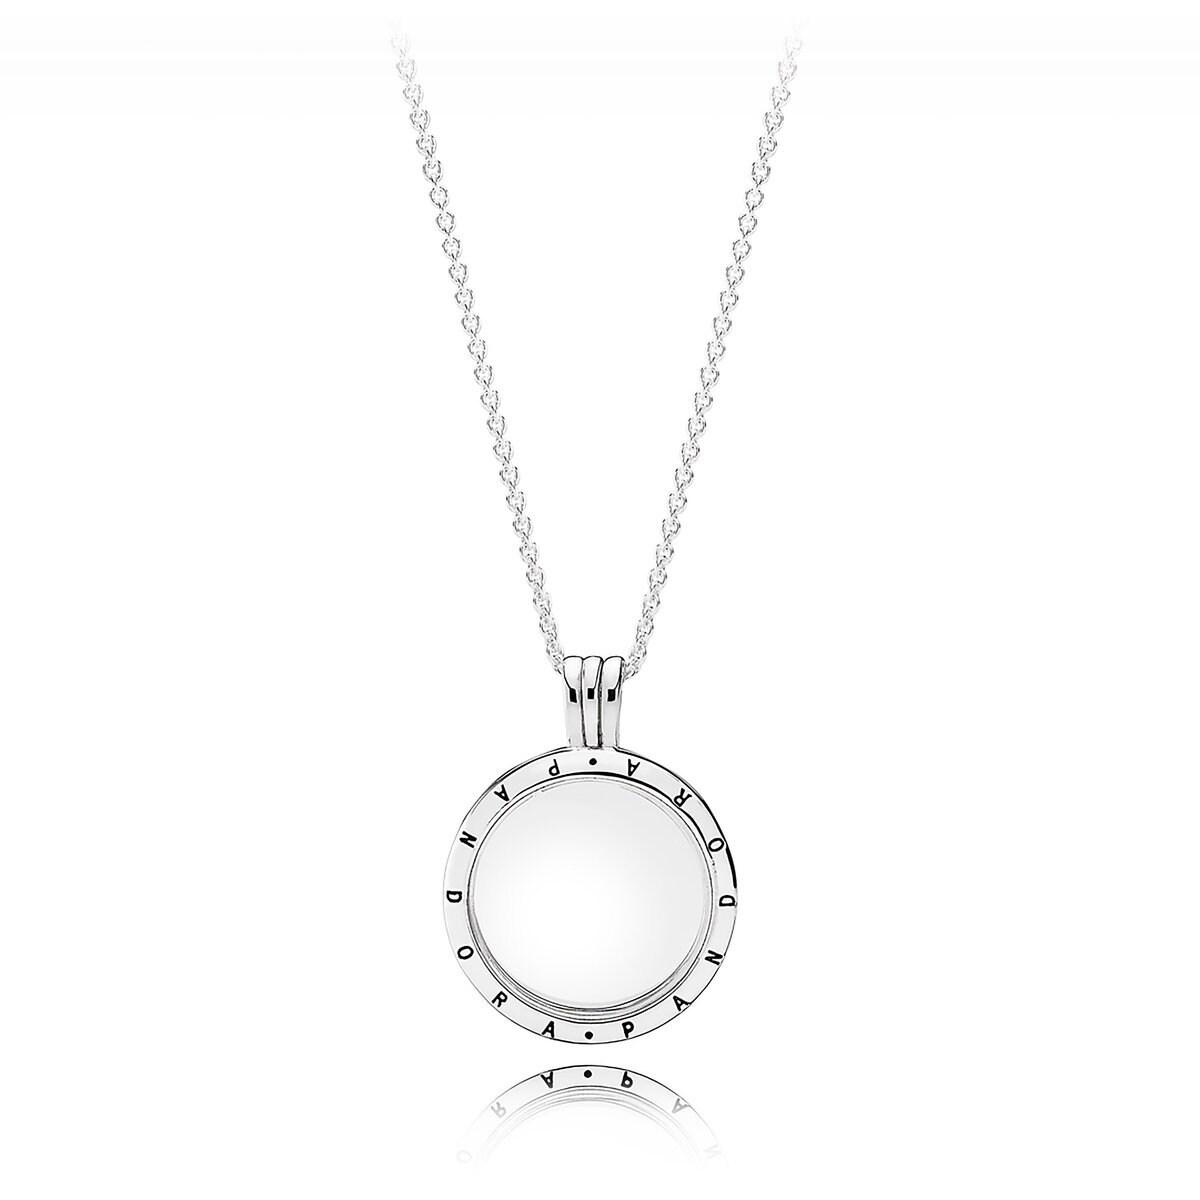 Floating locket necklace medium pandora shopdisney thumbnail image of floating locket necklace medium pandora 1 aloadofball Choice Image